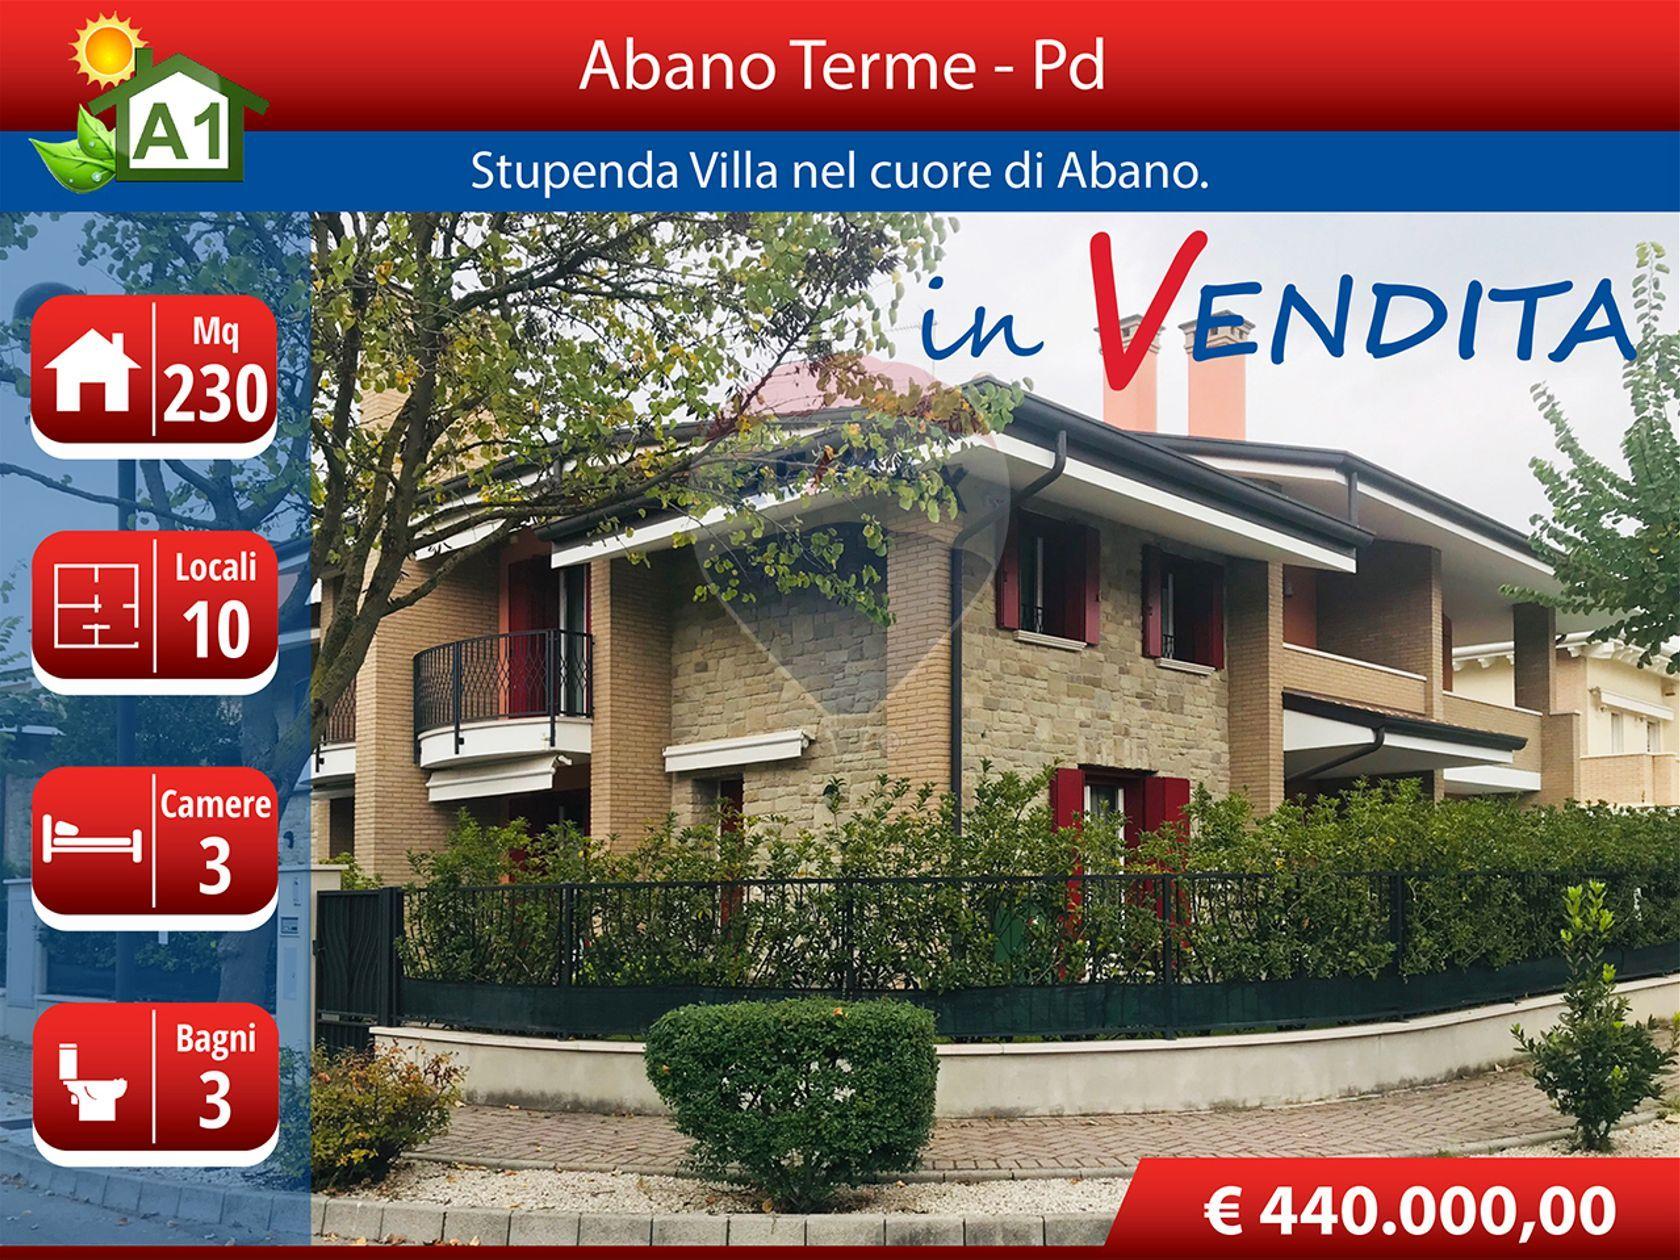 Casa Semindipendente Abano Terme, PD Vendita